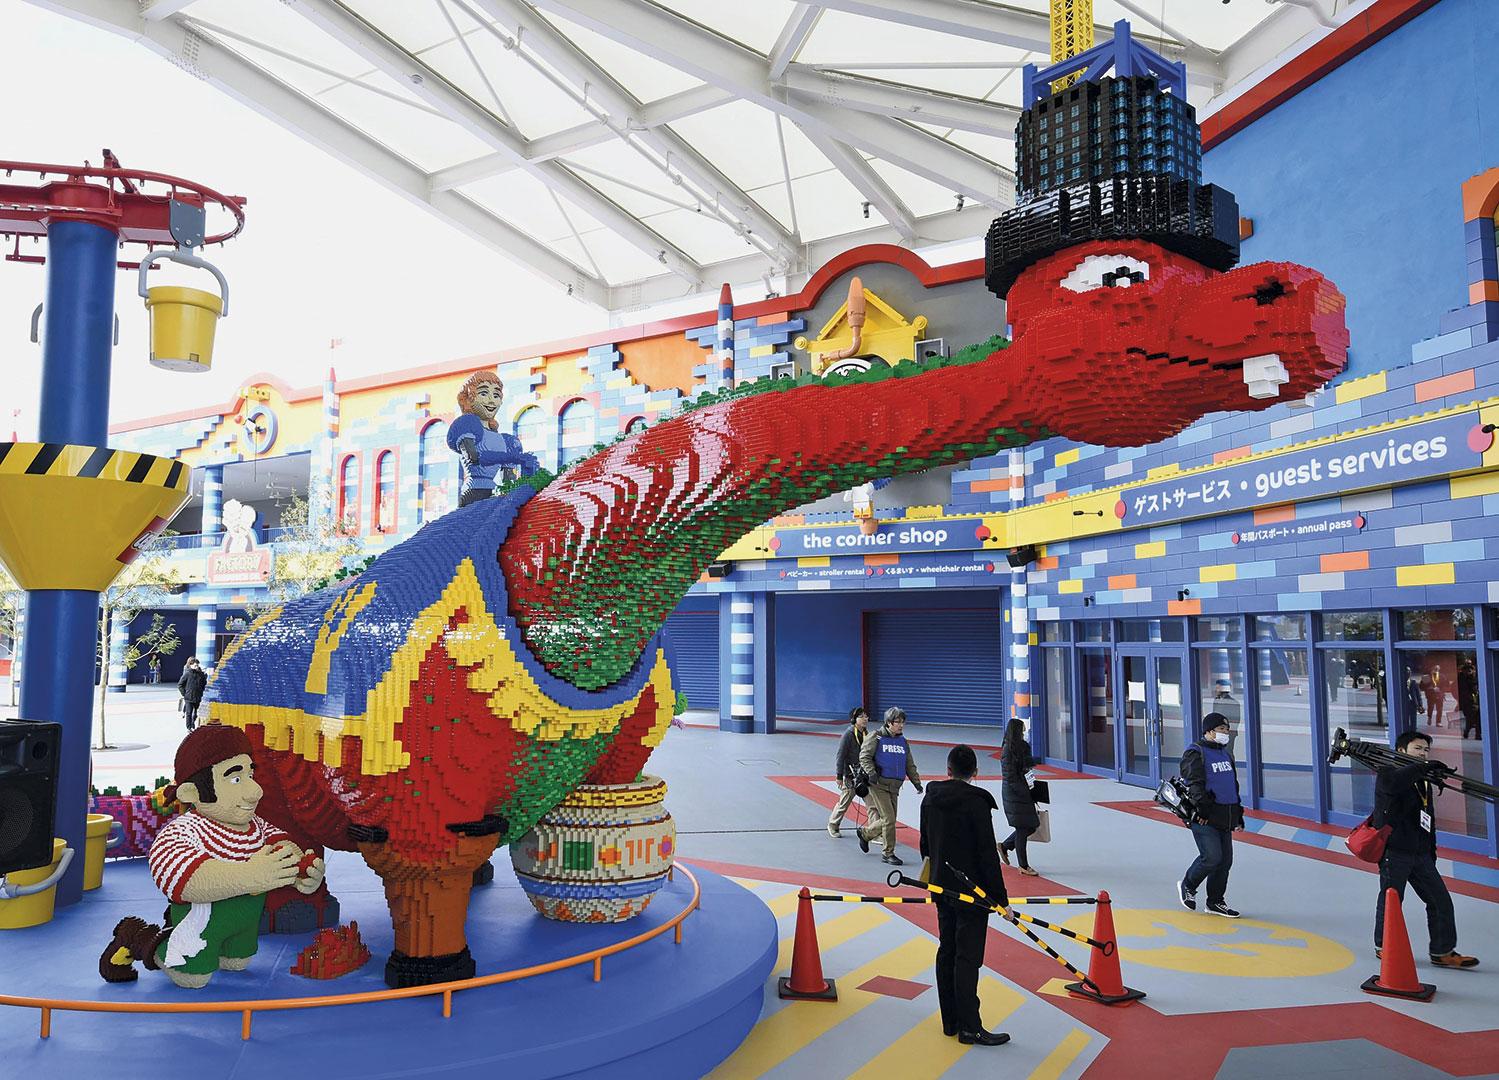 Legoland Opens in Australia and JapanDestinAsian | DestinAsian